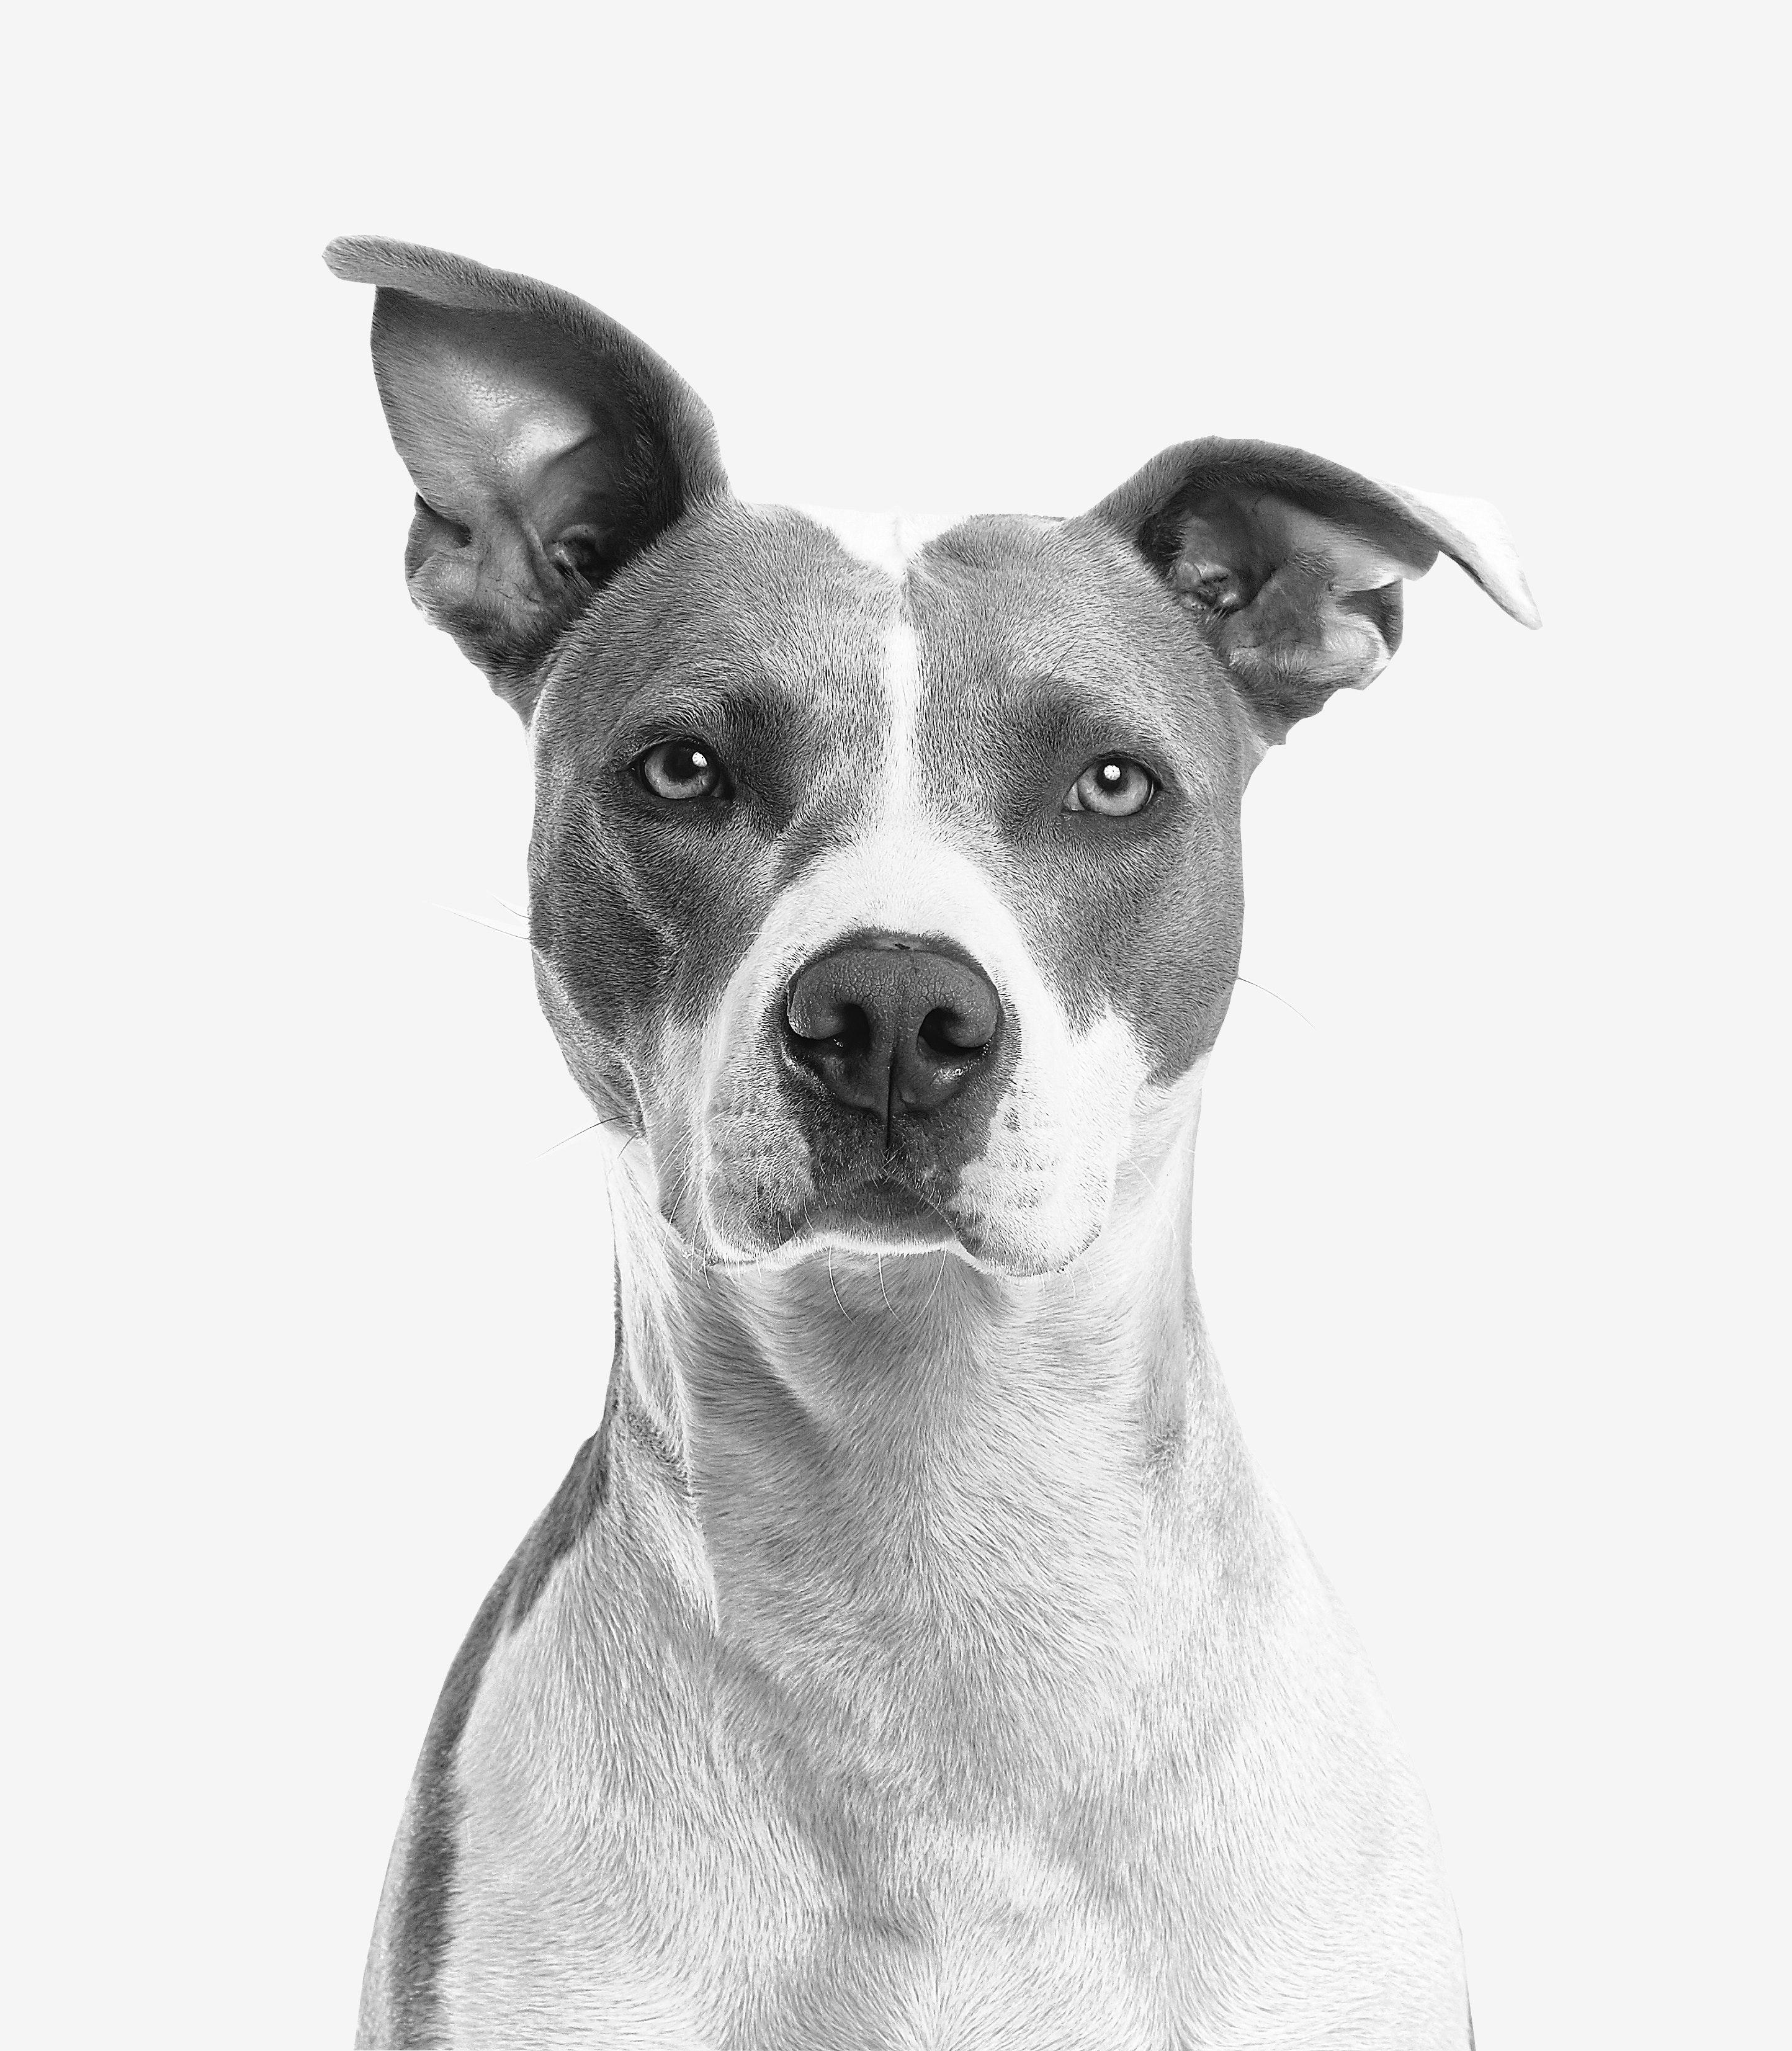 Closeup Photo of Short-coated White and Gray Dog, Portrait, Pet, Monochrome, Mammal, HQ Photo